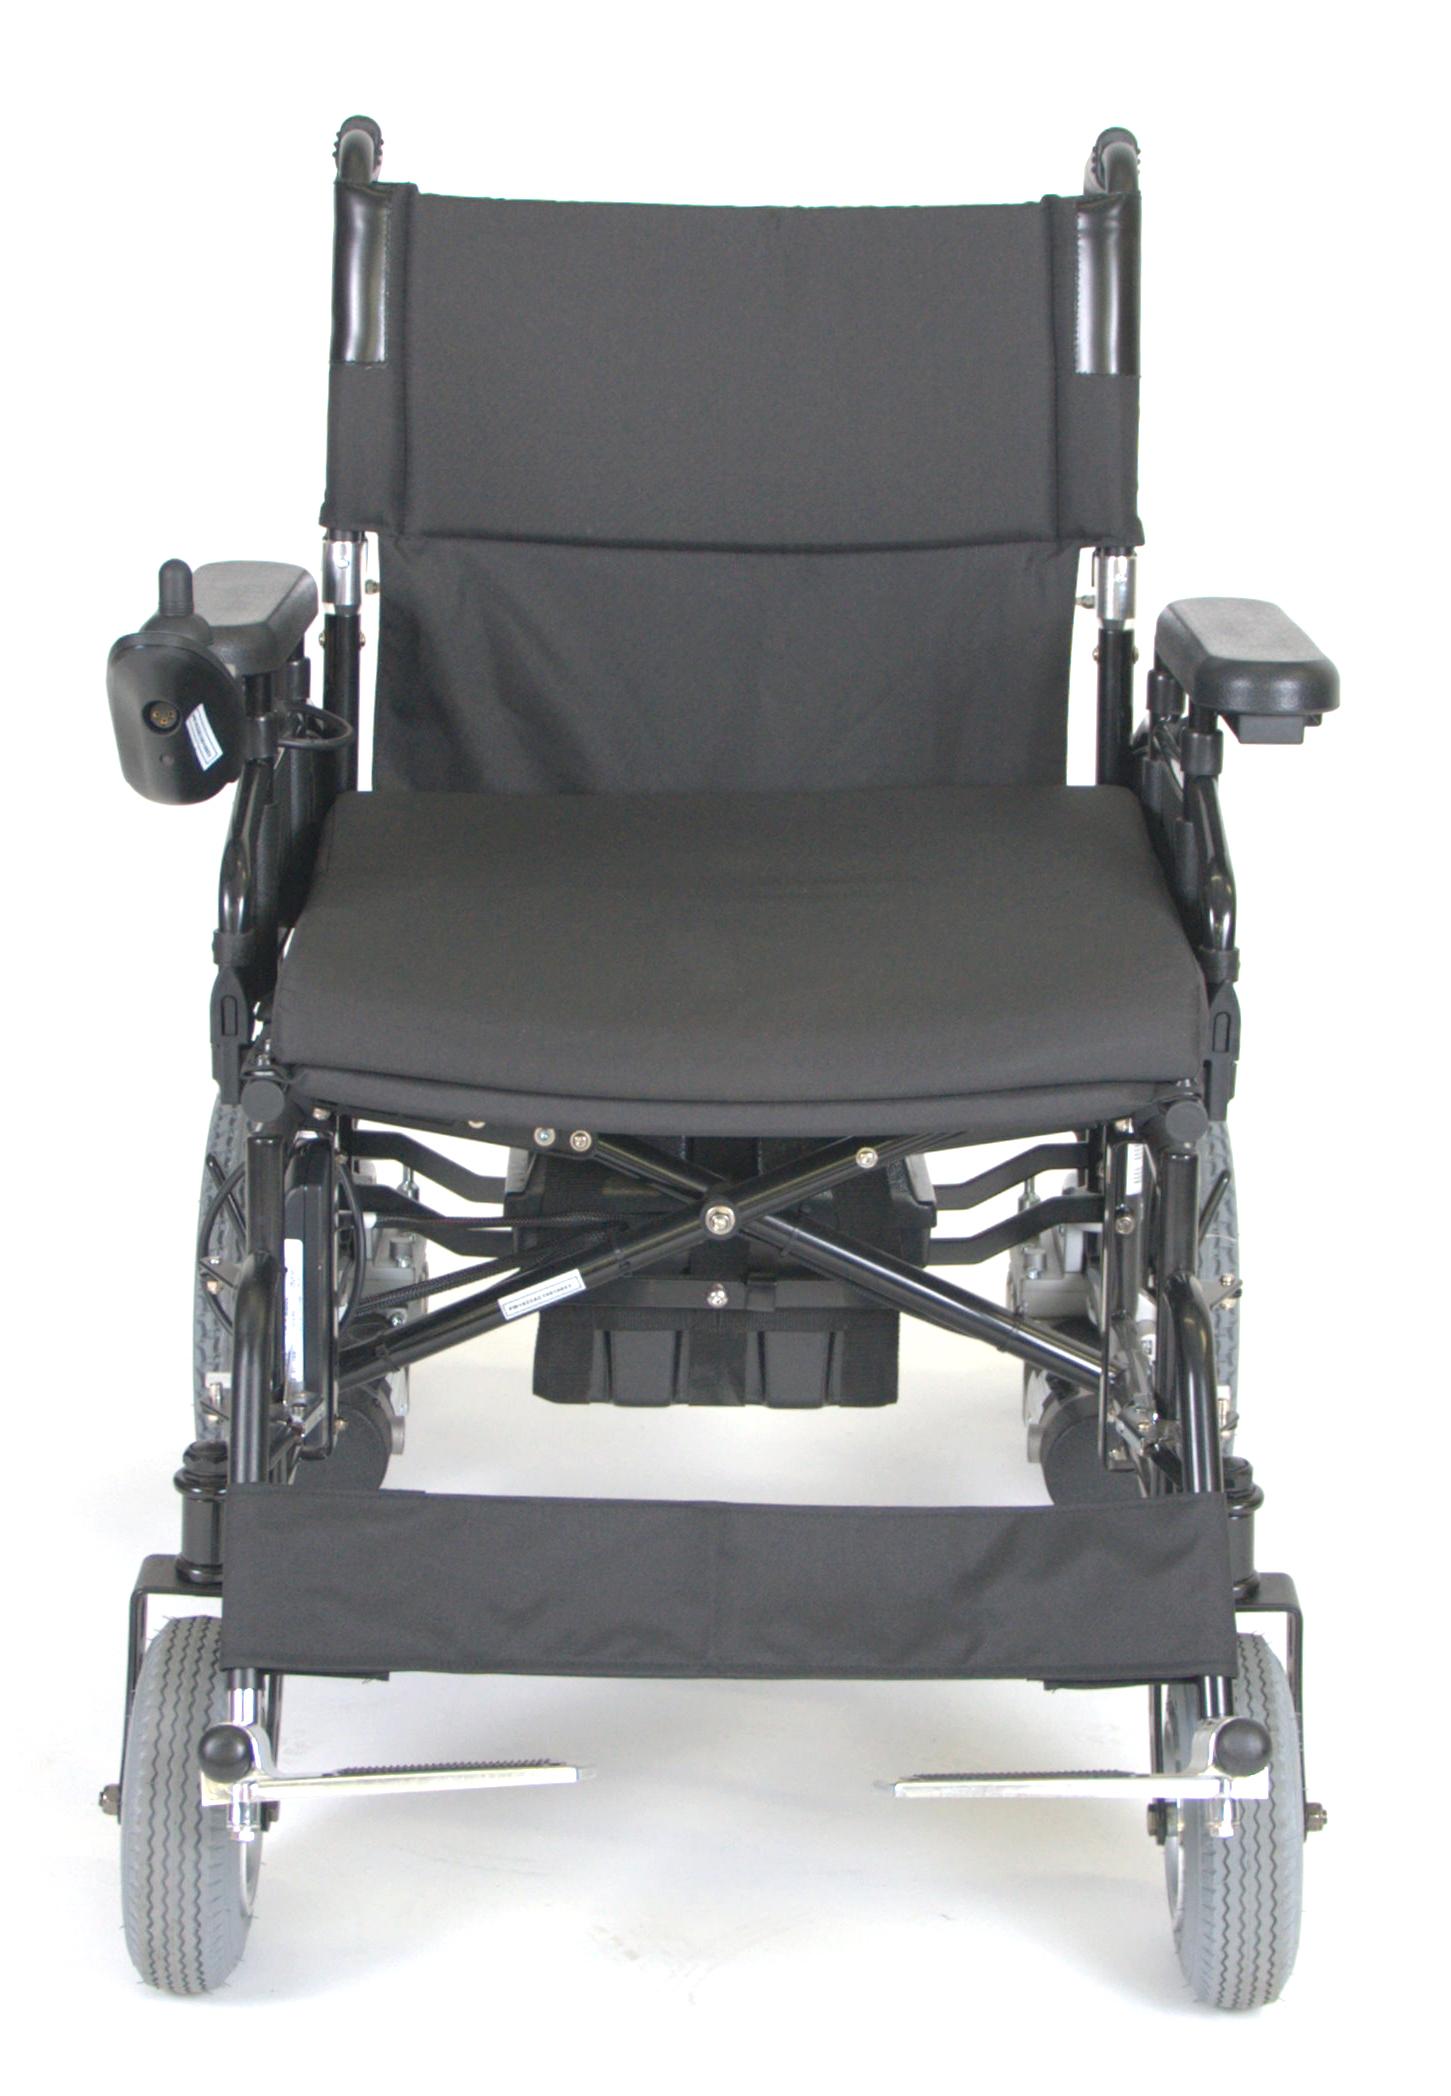 wildcat-450-heavy-duty-folding-power-wheelchair-wildcat450-20-drive-medical-2.jpg